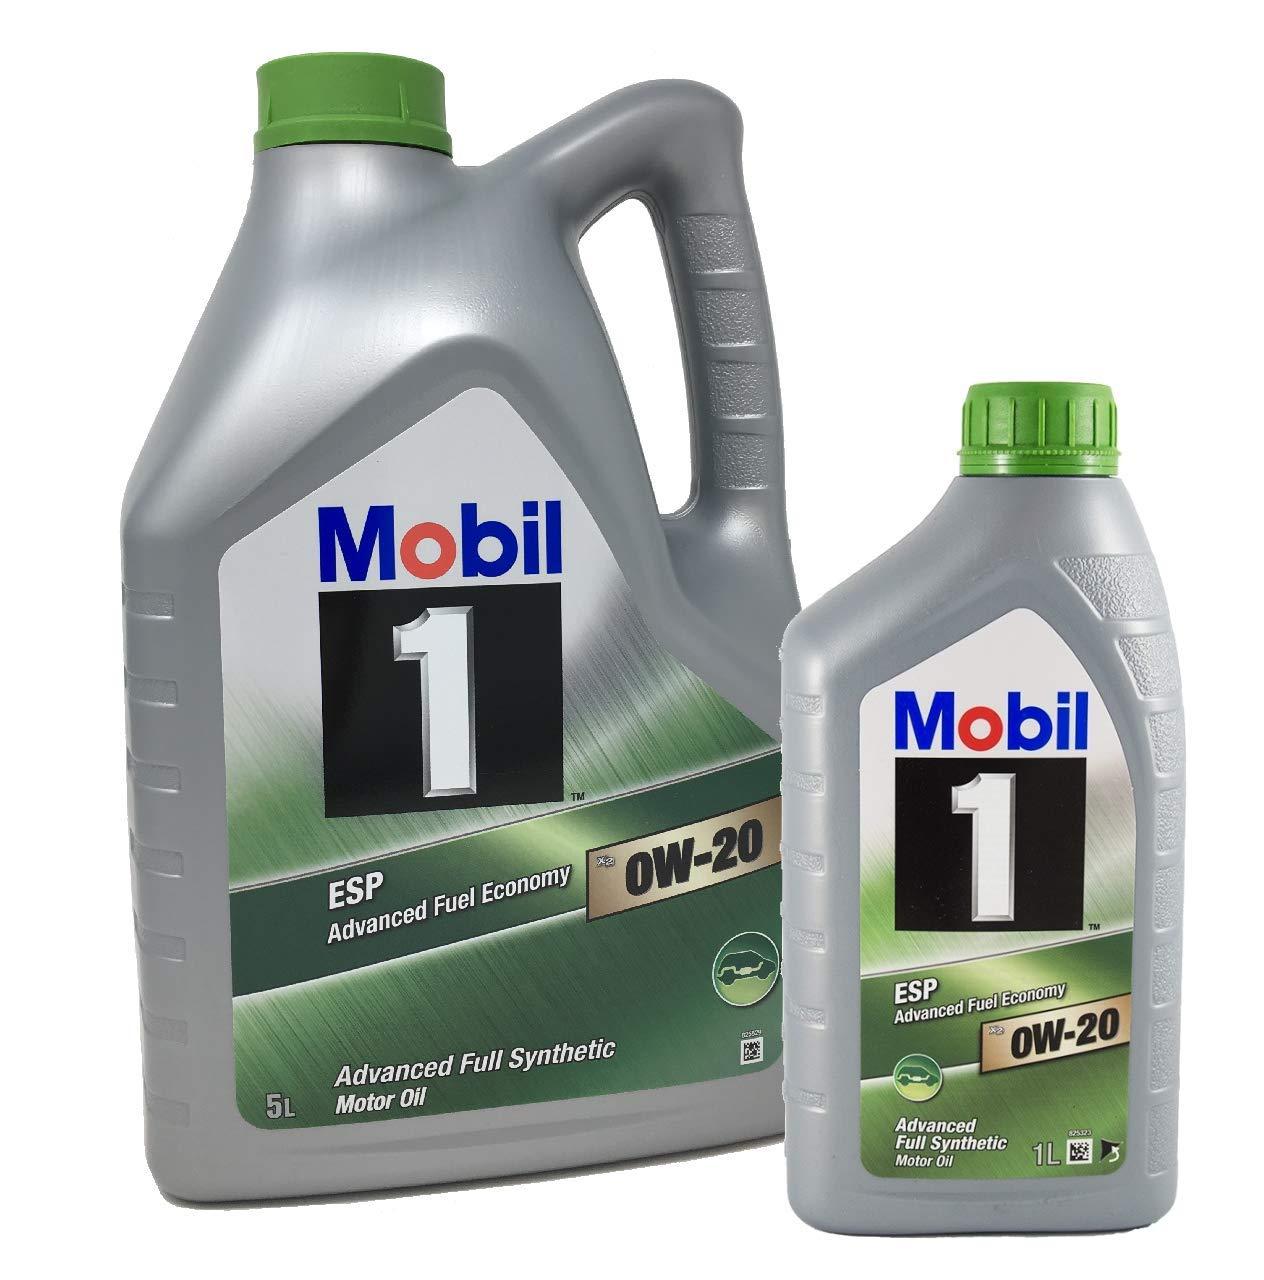 Mobil 1 Aceite para Motor ESP x2 0W-20 Advanced Fuel Economy, Pack ...